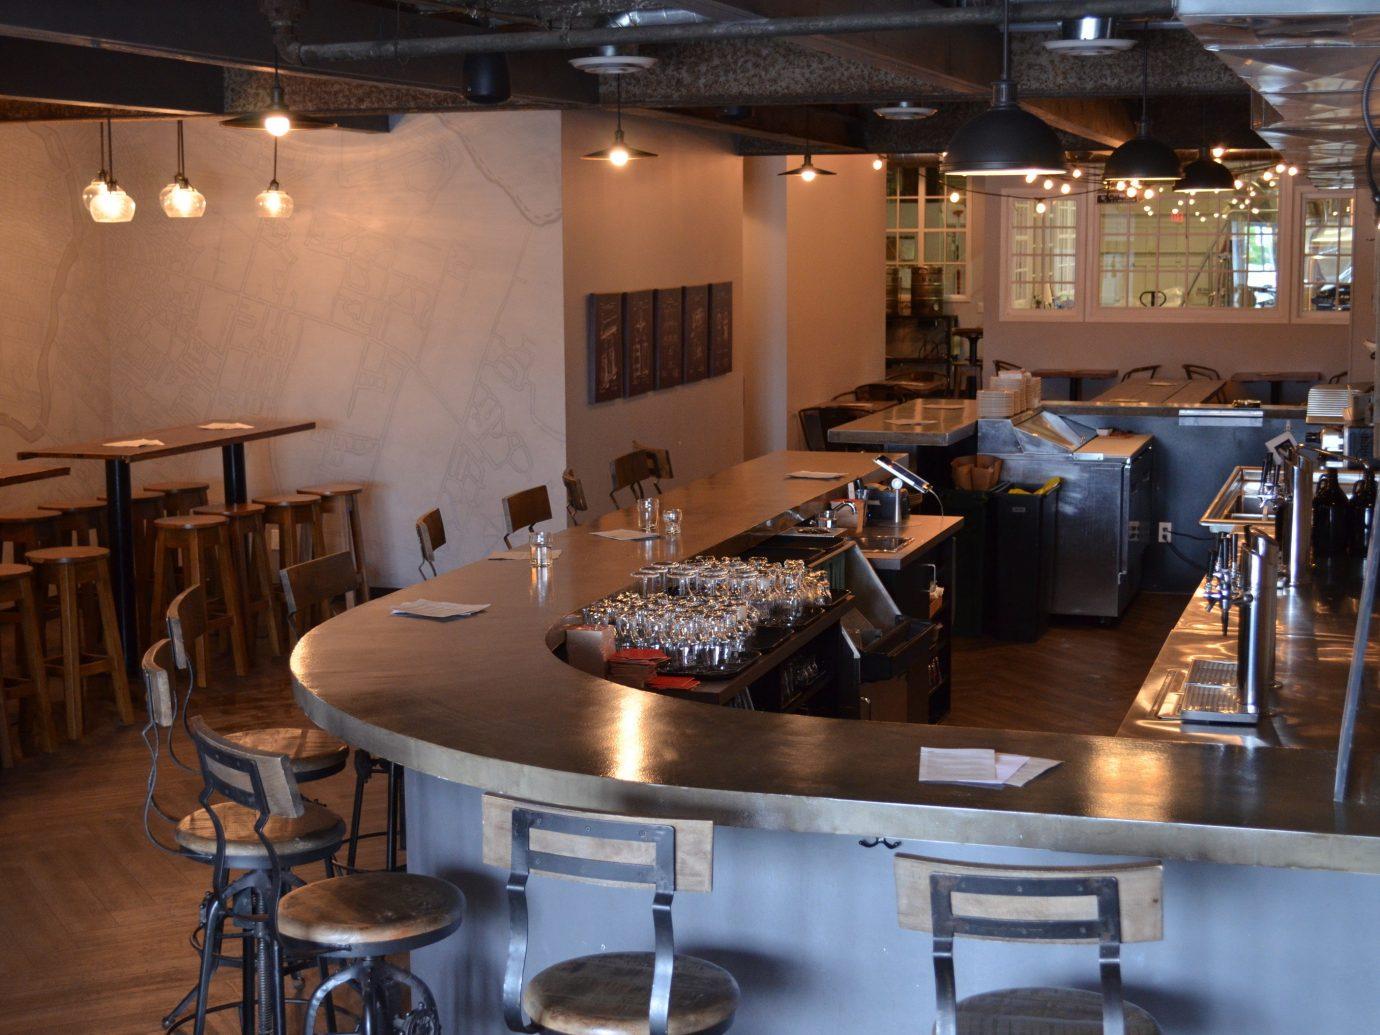 Food + Drink indoor floor table room ceiling restaurant interior design meal Design Bar café Dining furniture area dining room